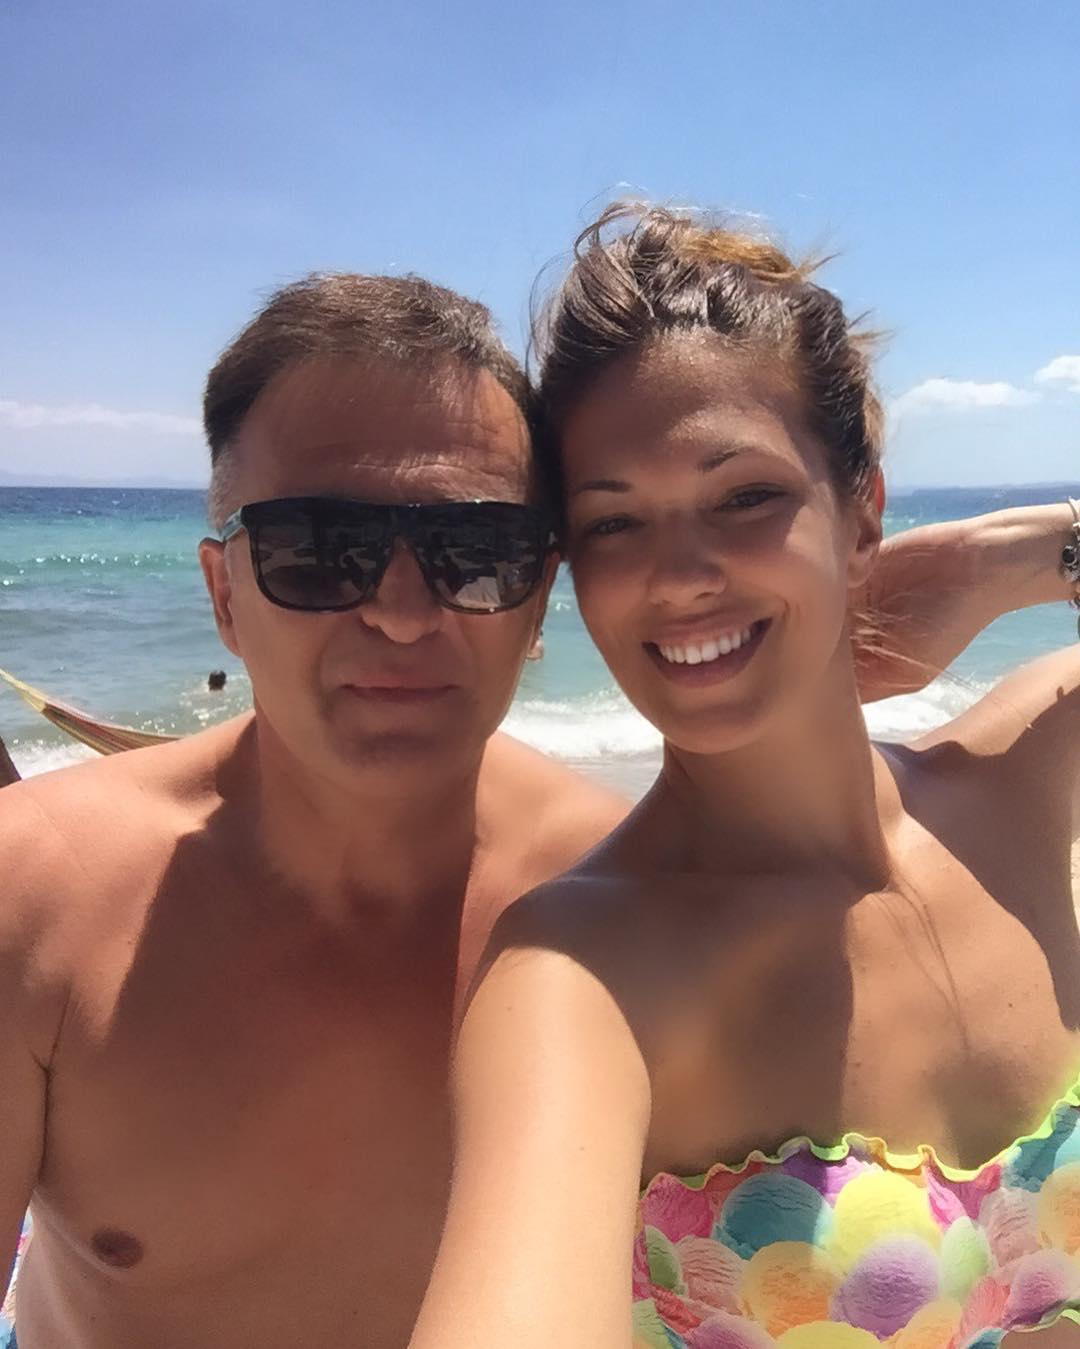 Nina i Leka dali zvanično saopštenje povodom razvoda i priznali sve javnosti!